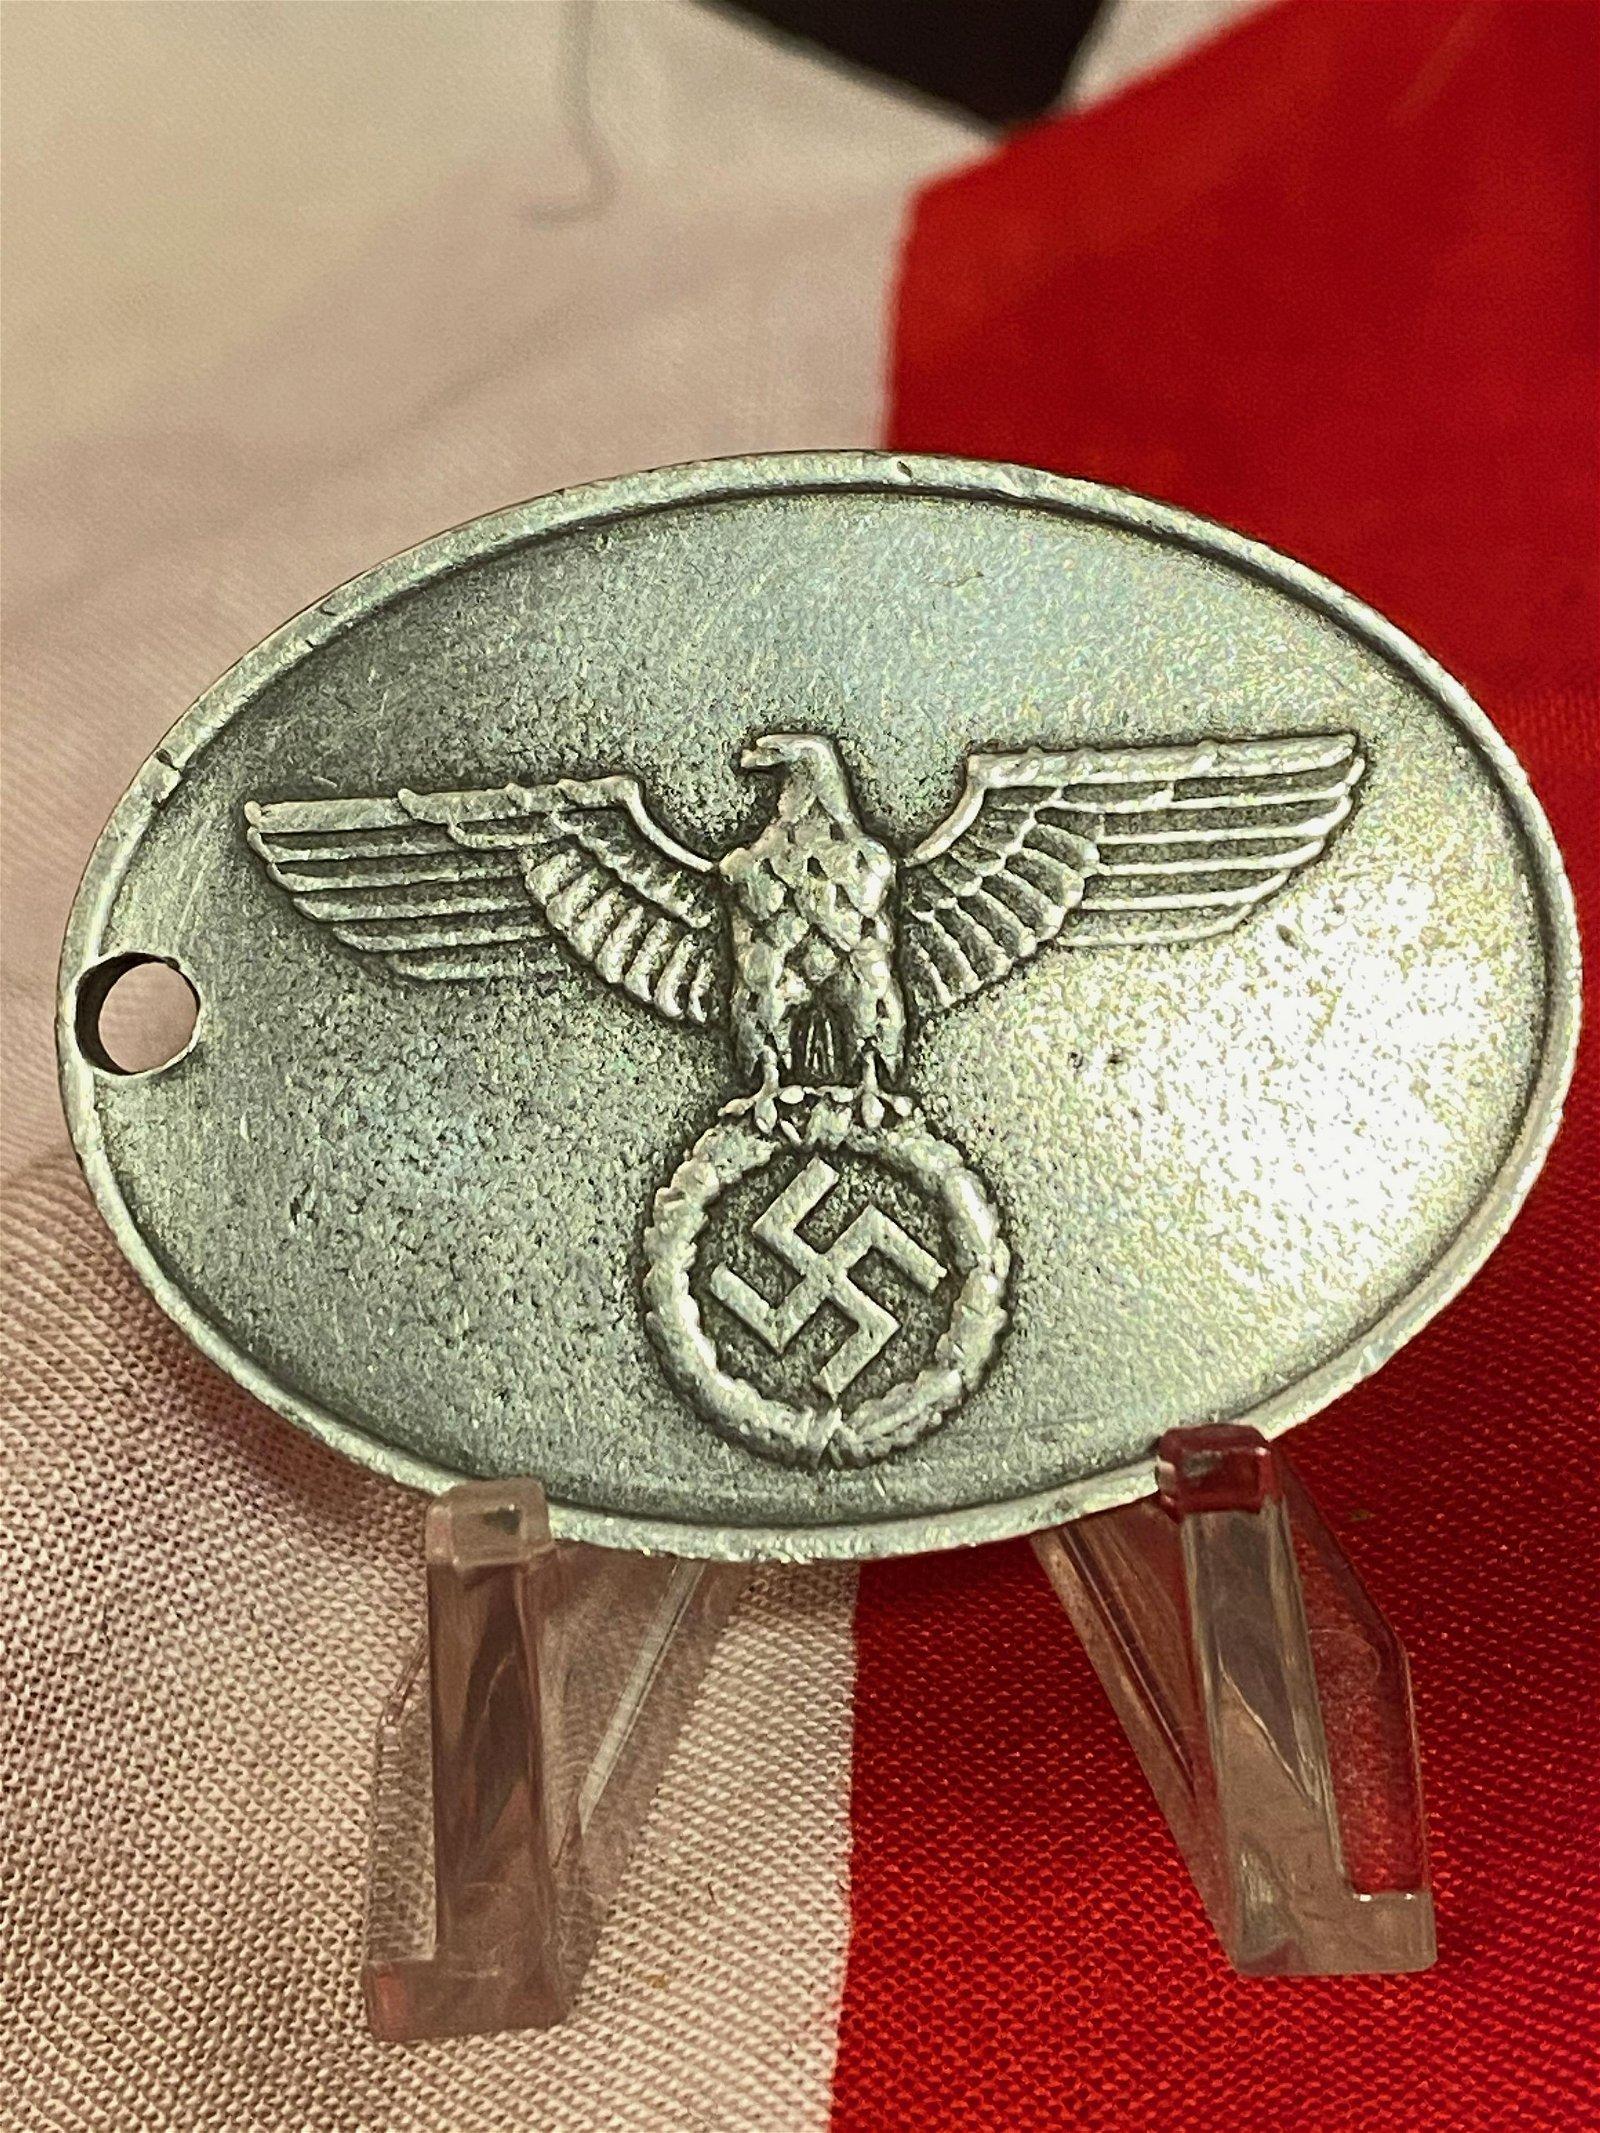 WW2 GERMAN NAZI SECRET STATE POLICE BADGE - GEHEIME